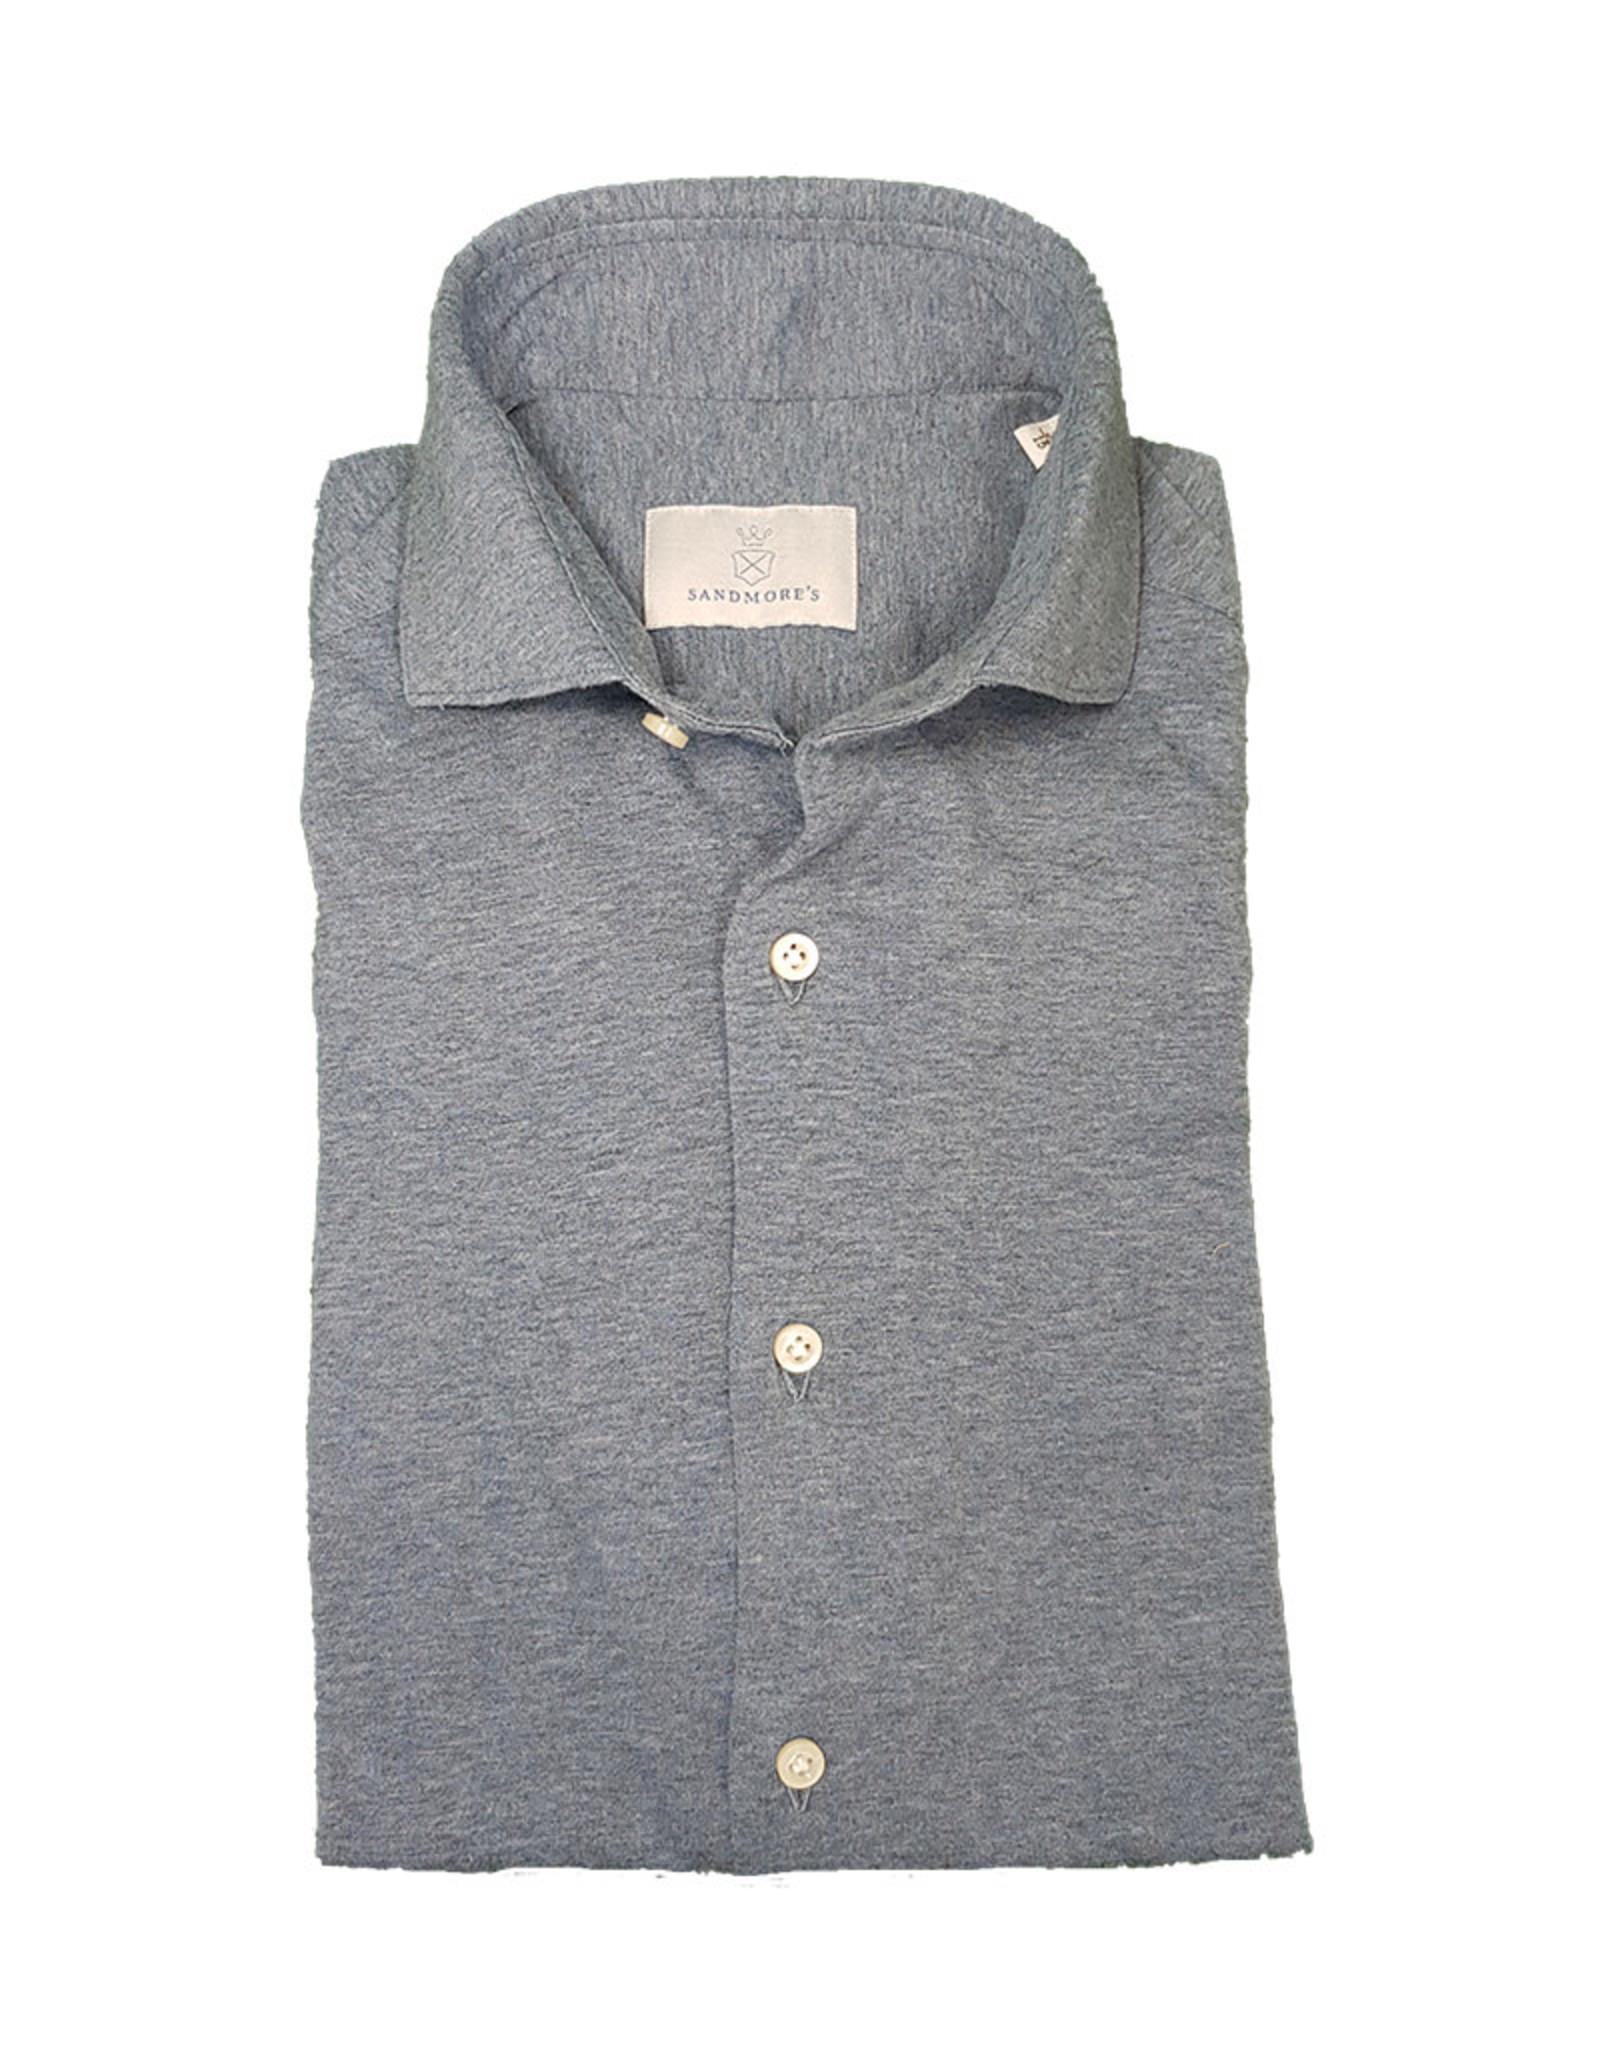 Ghirardelli Sandmore's hemd jersey lichtblauw Semi-slim J553